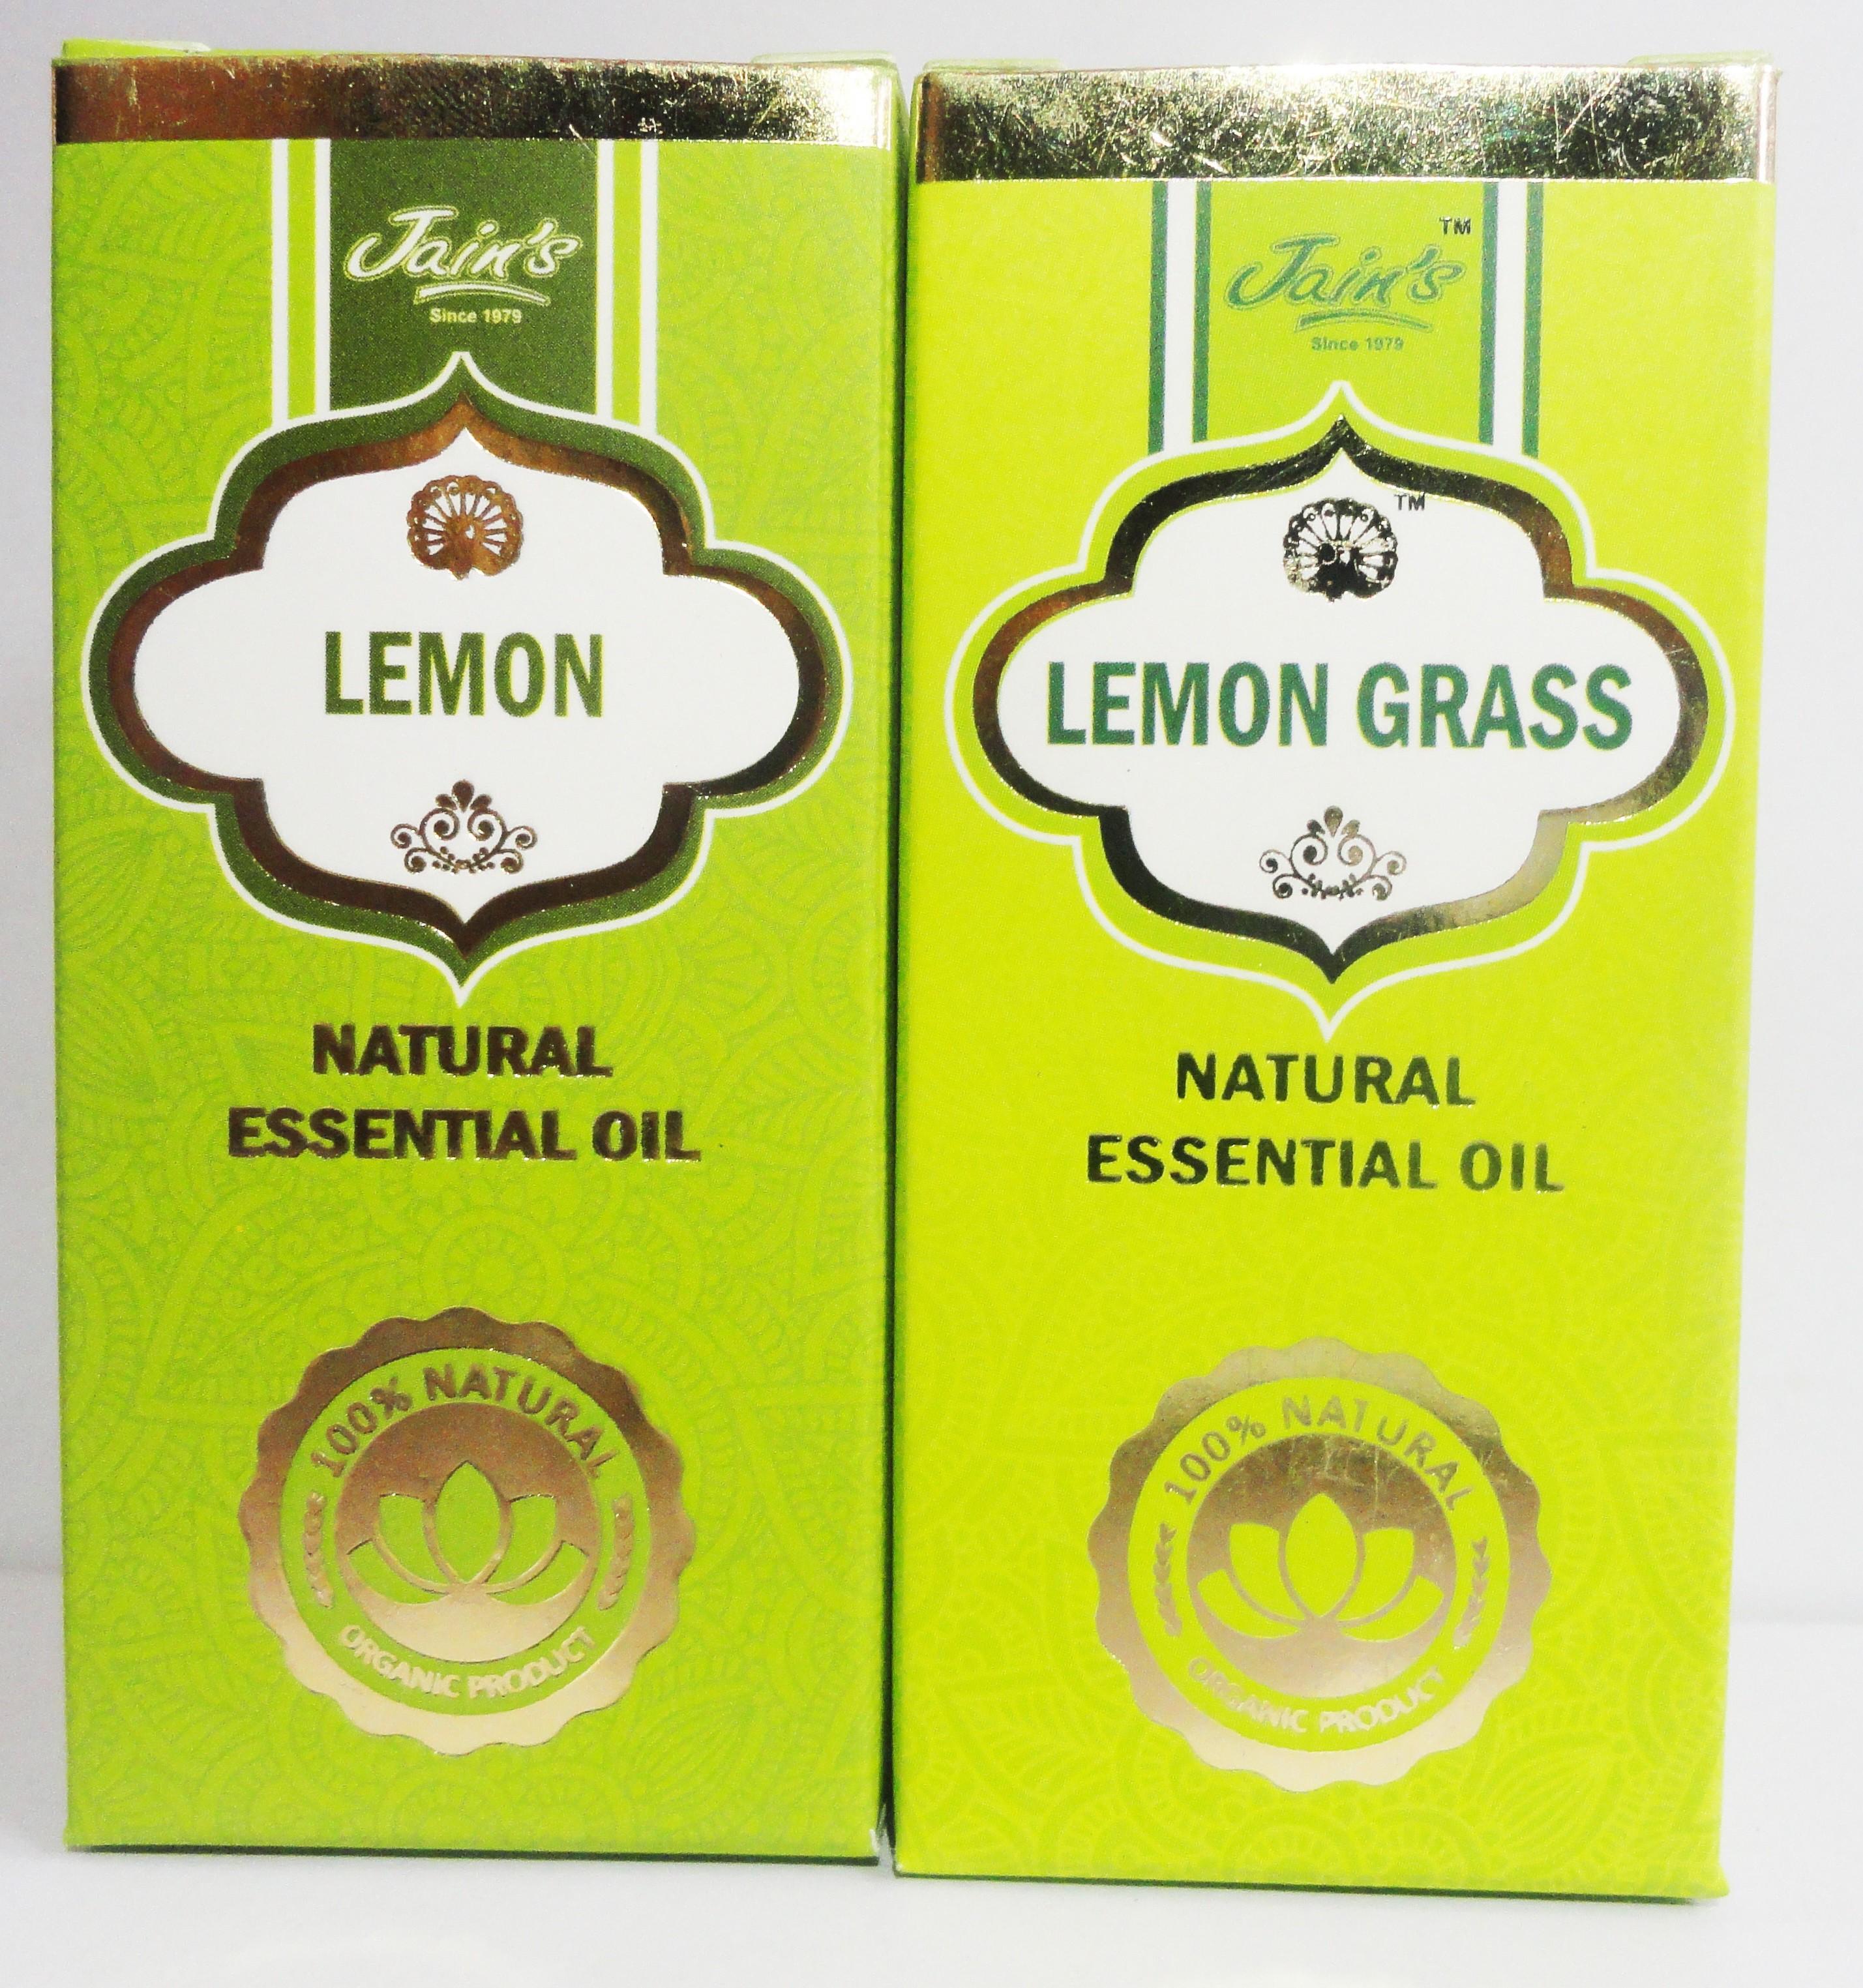 Jains Set of 2 Natural Essential Oil (10 ml each) Scent: Lemon, Lemon Grass(20 ml)